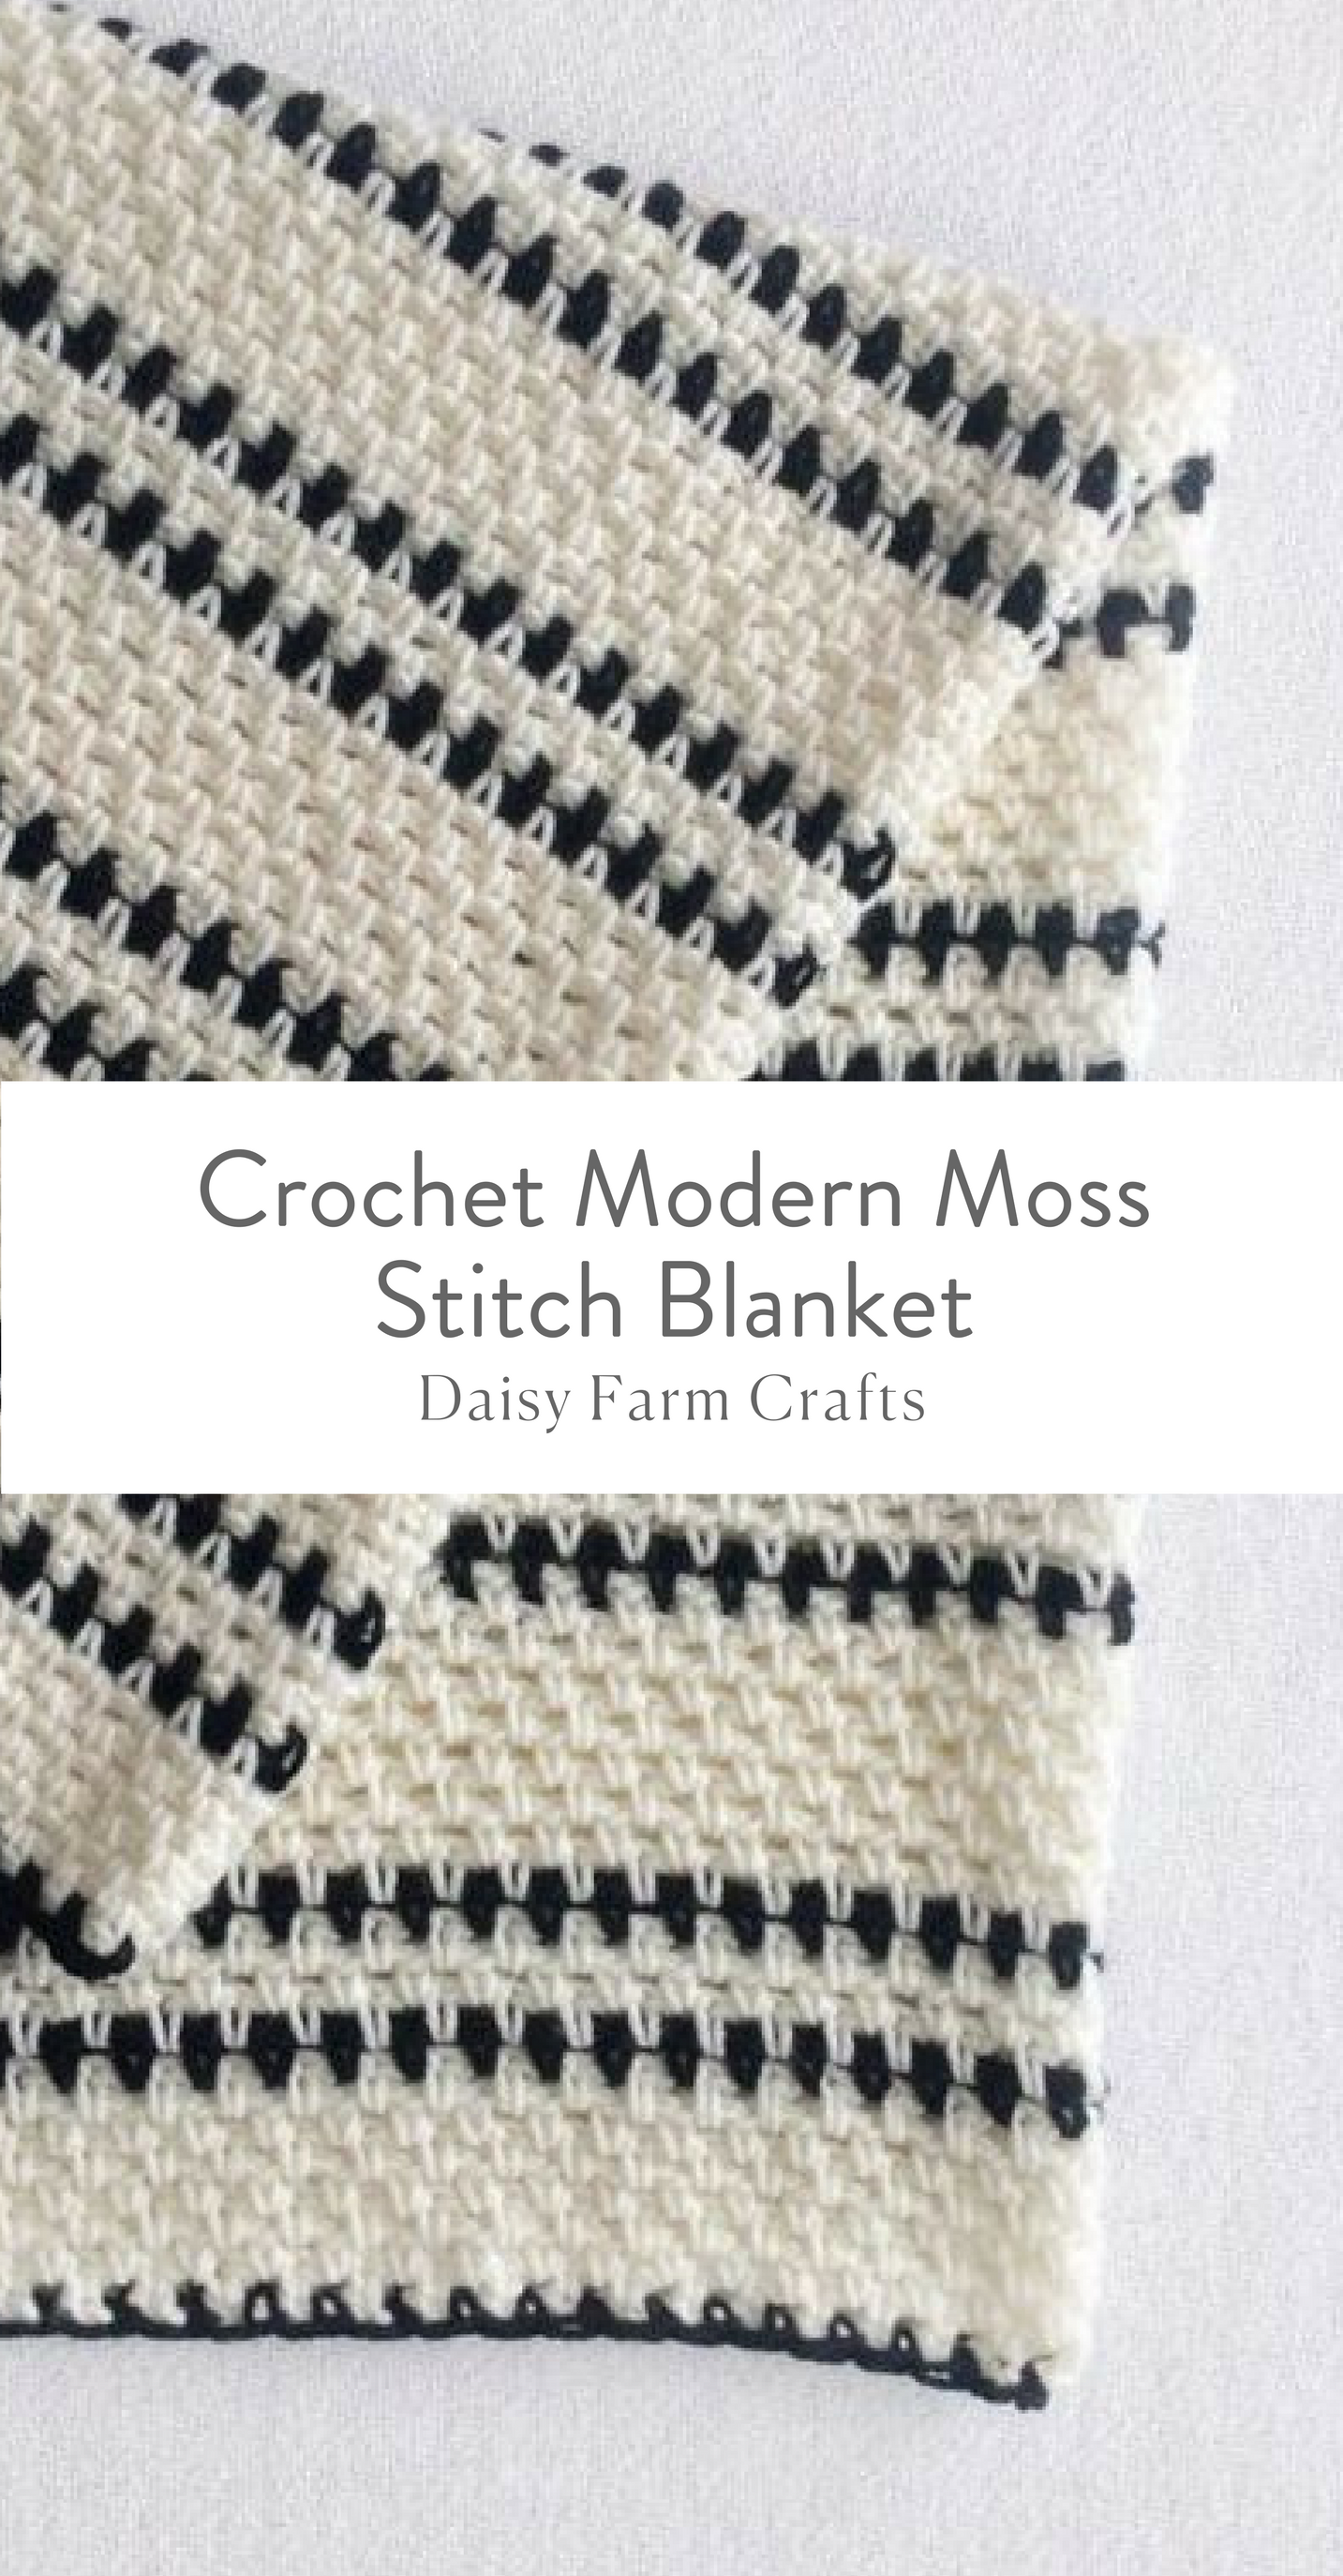 Free Pattern - Crochet Modern Moss Stitch Blanket | Afghan Love ...